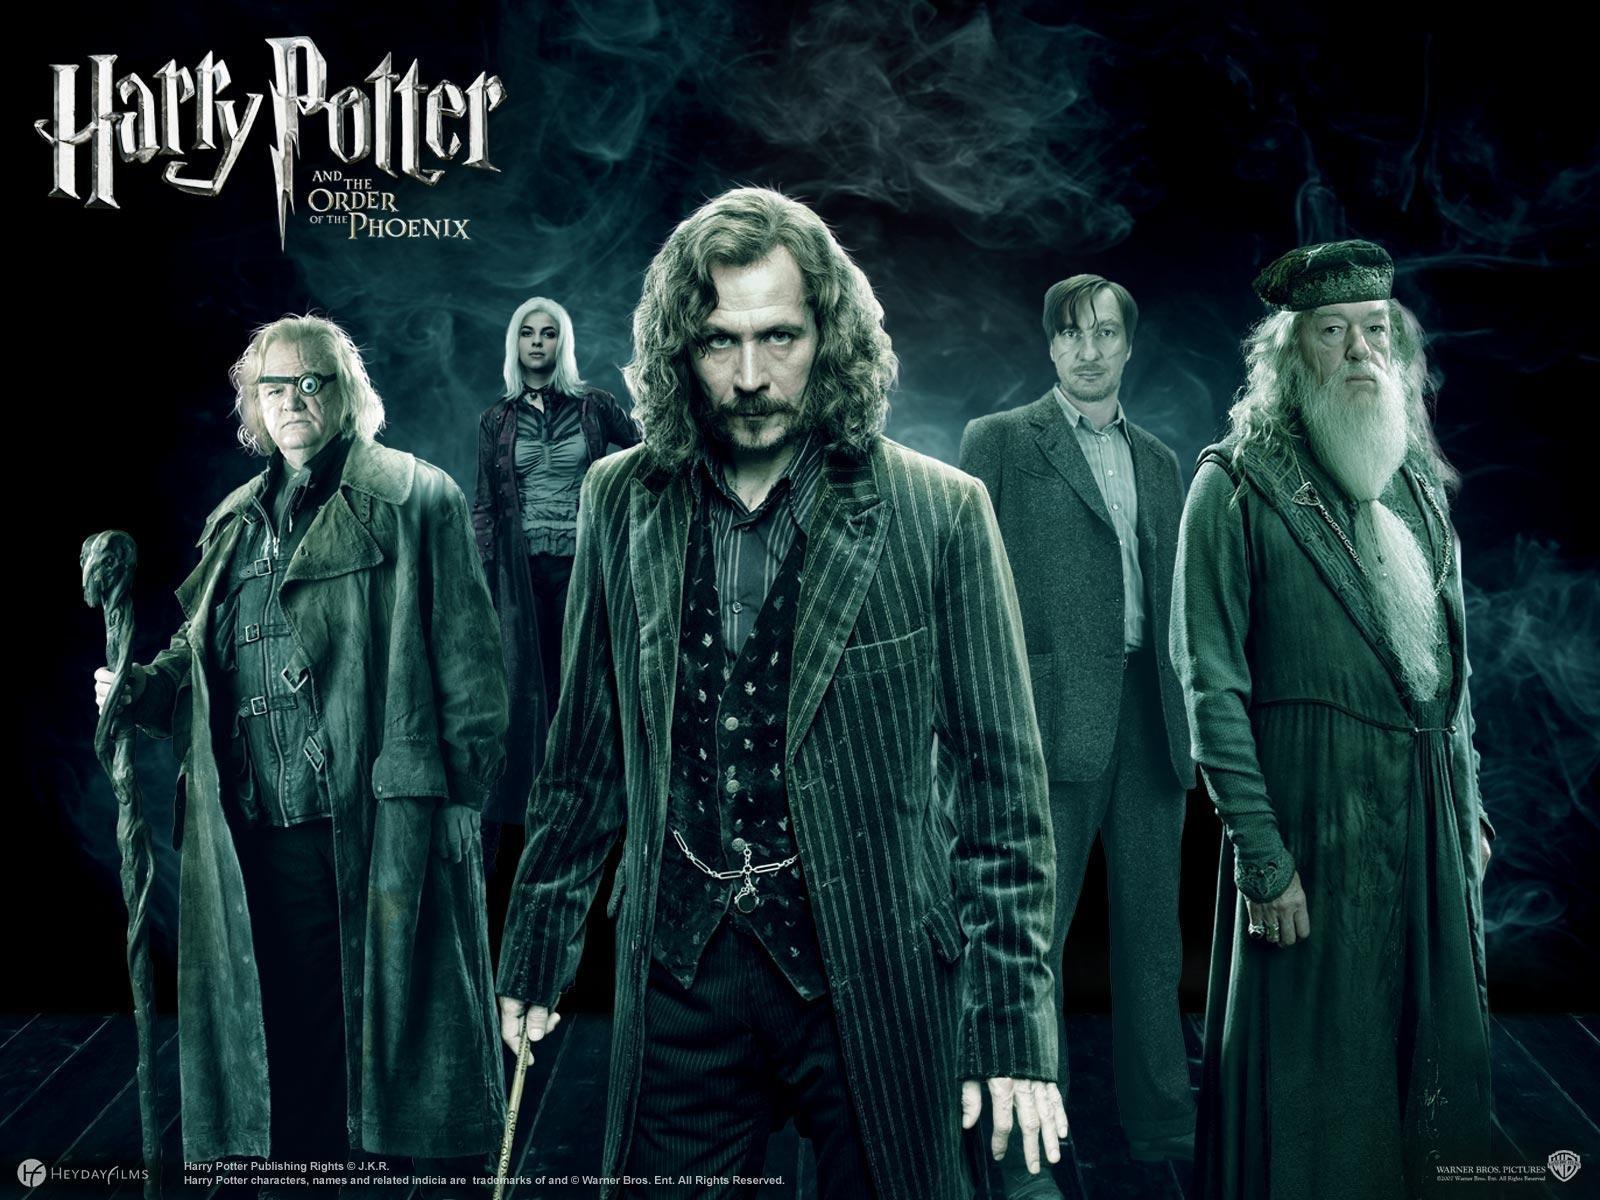 http://2.bp.blogspot.com/-zfWdsgoSAhA/TdKGwFHgidI/AAAAAAAAAFQ/6W78kqZyQhg/s1600/Harry-Potter-The-Order-Phoenix-Sirius-Black-684.jpg